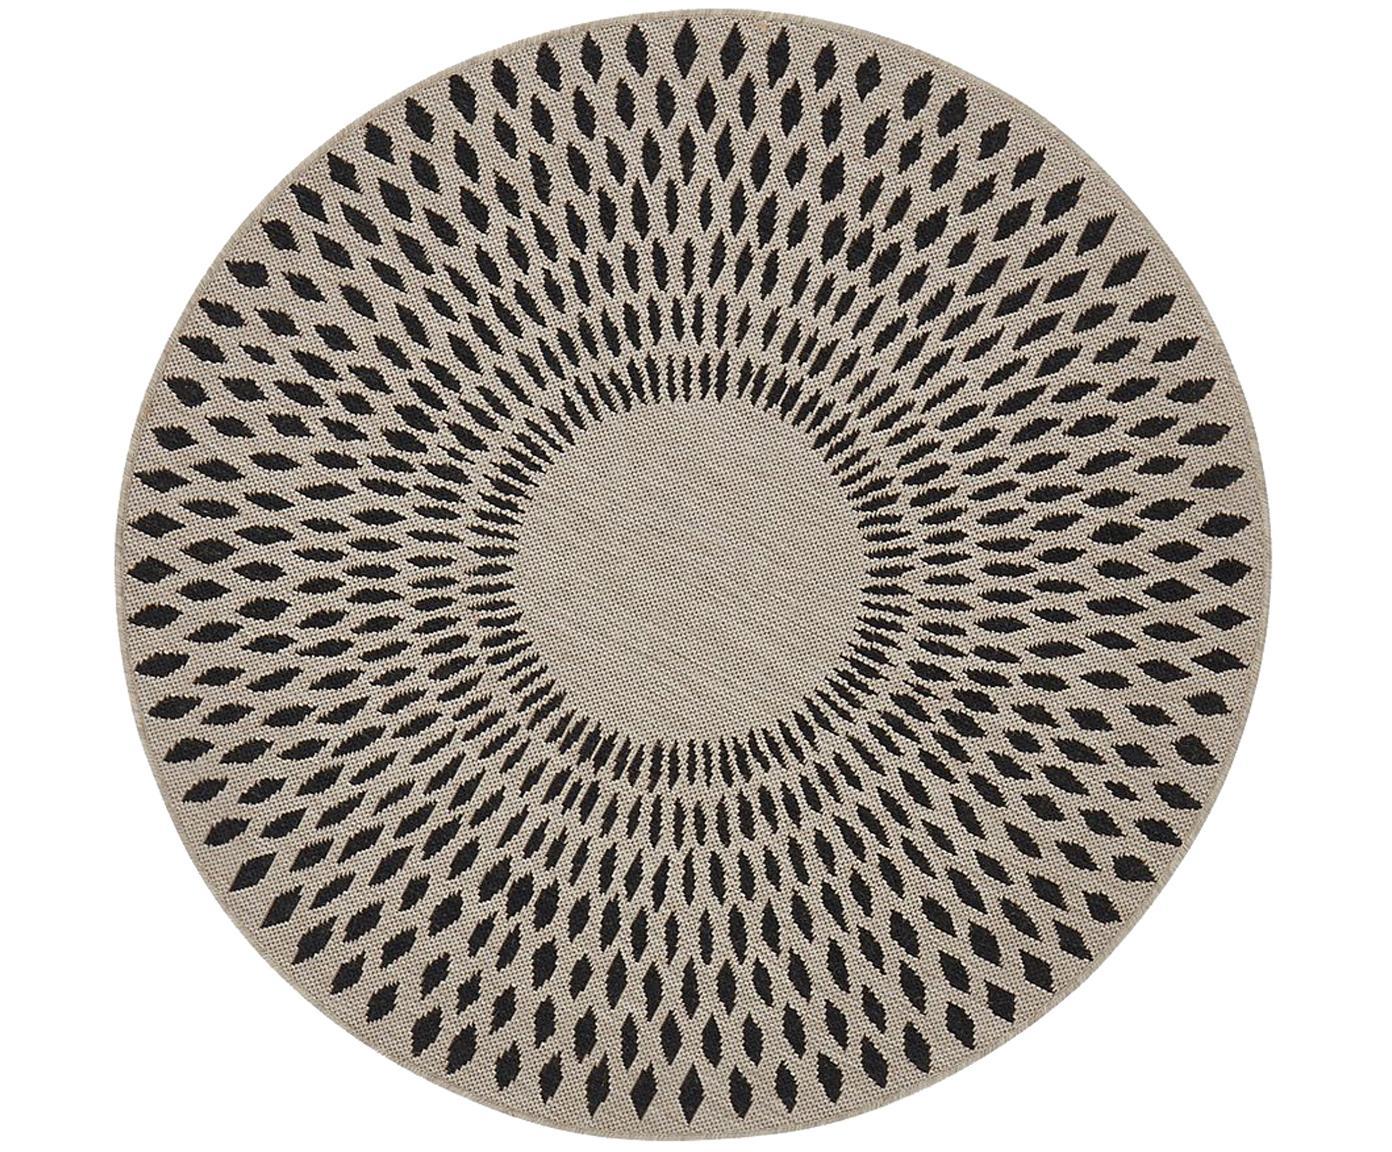 Tappeto da interno-esterno Agna, Polipropilene, Sabbia, antracite, Ø 120 cm